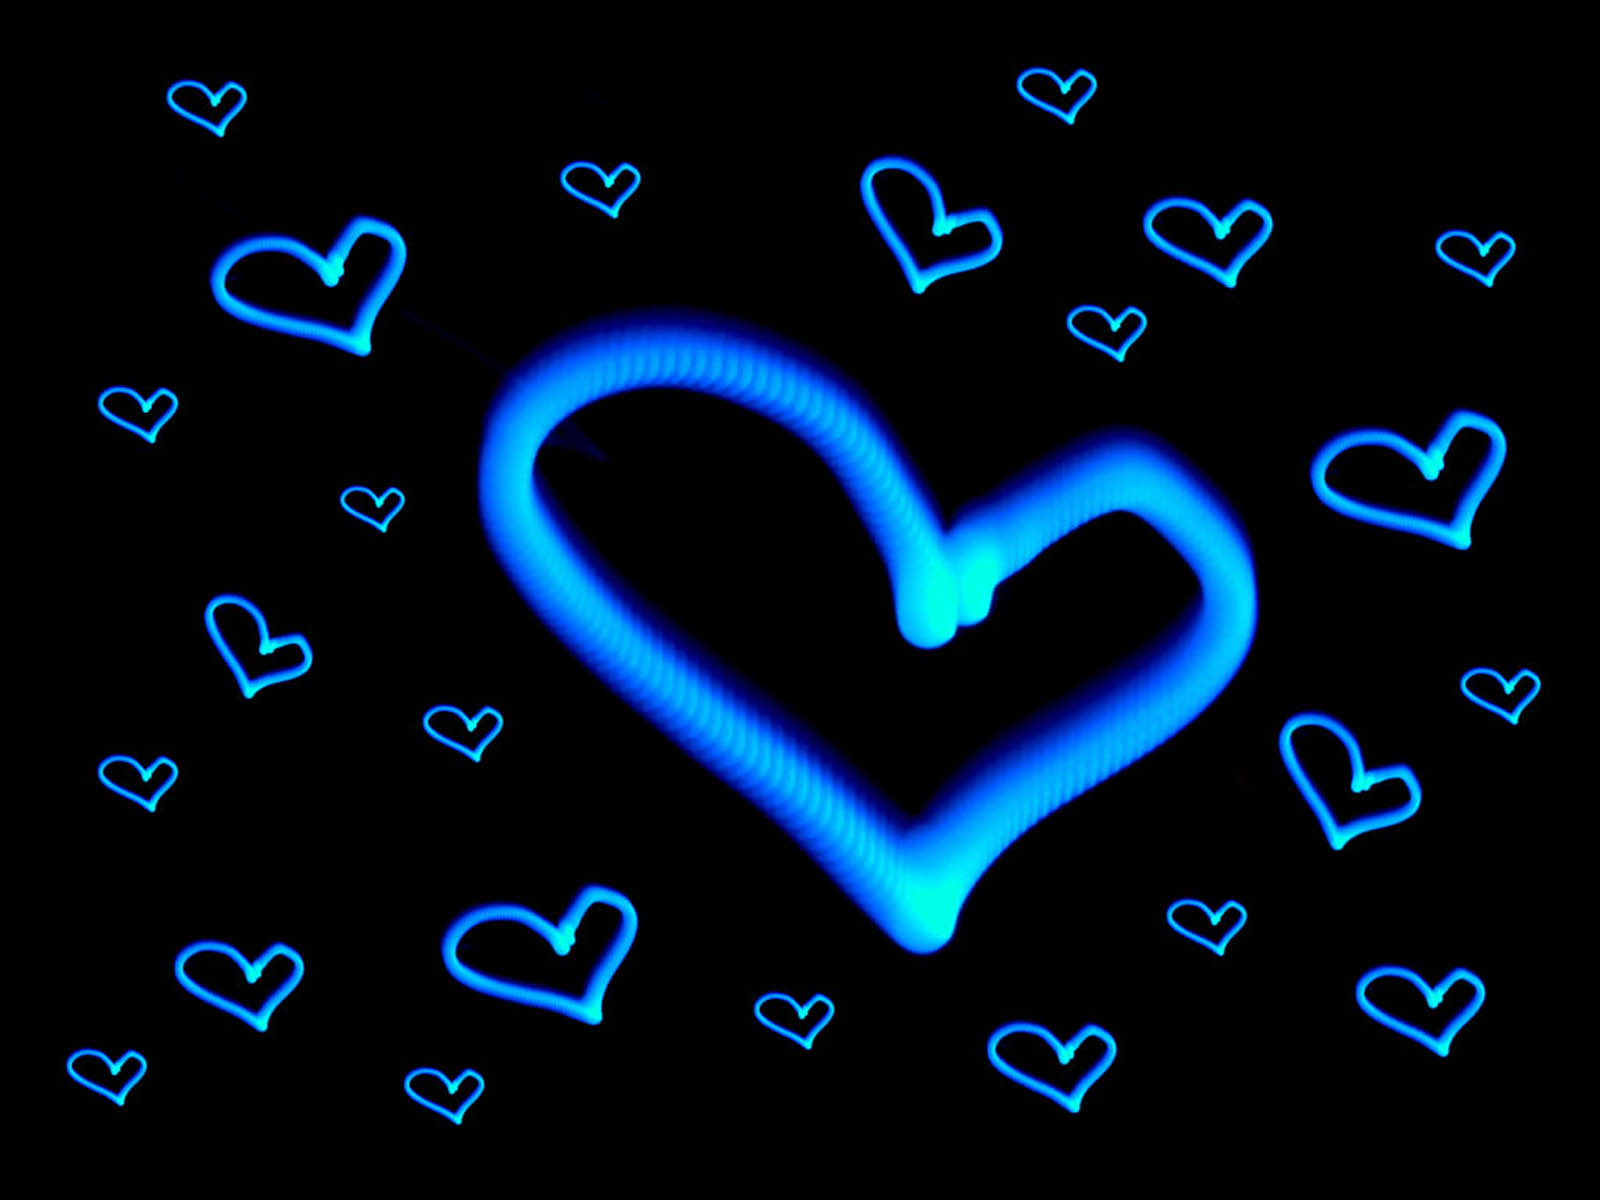 Free download wallpaper Heart Love Wallpapers [1600x1200 ...